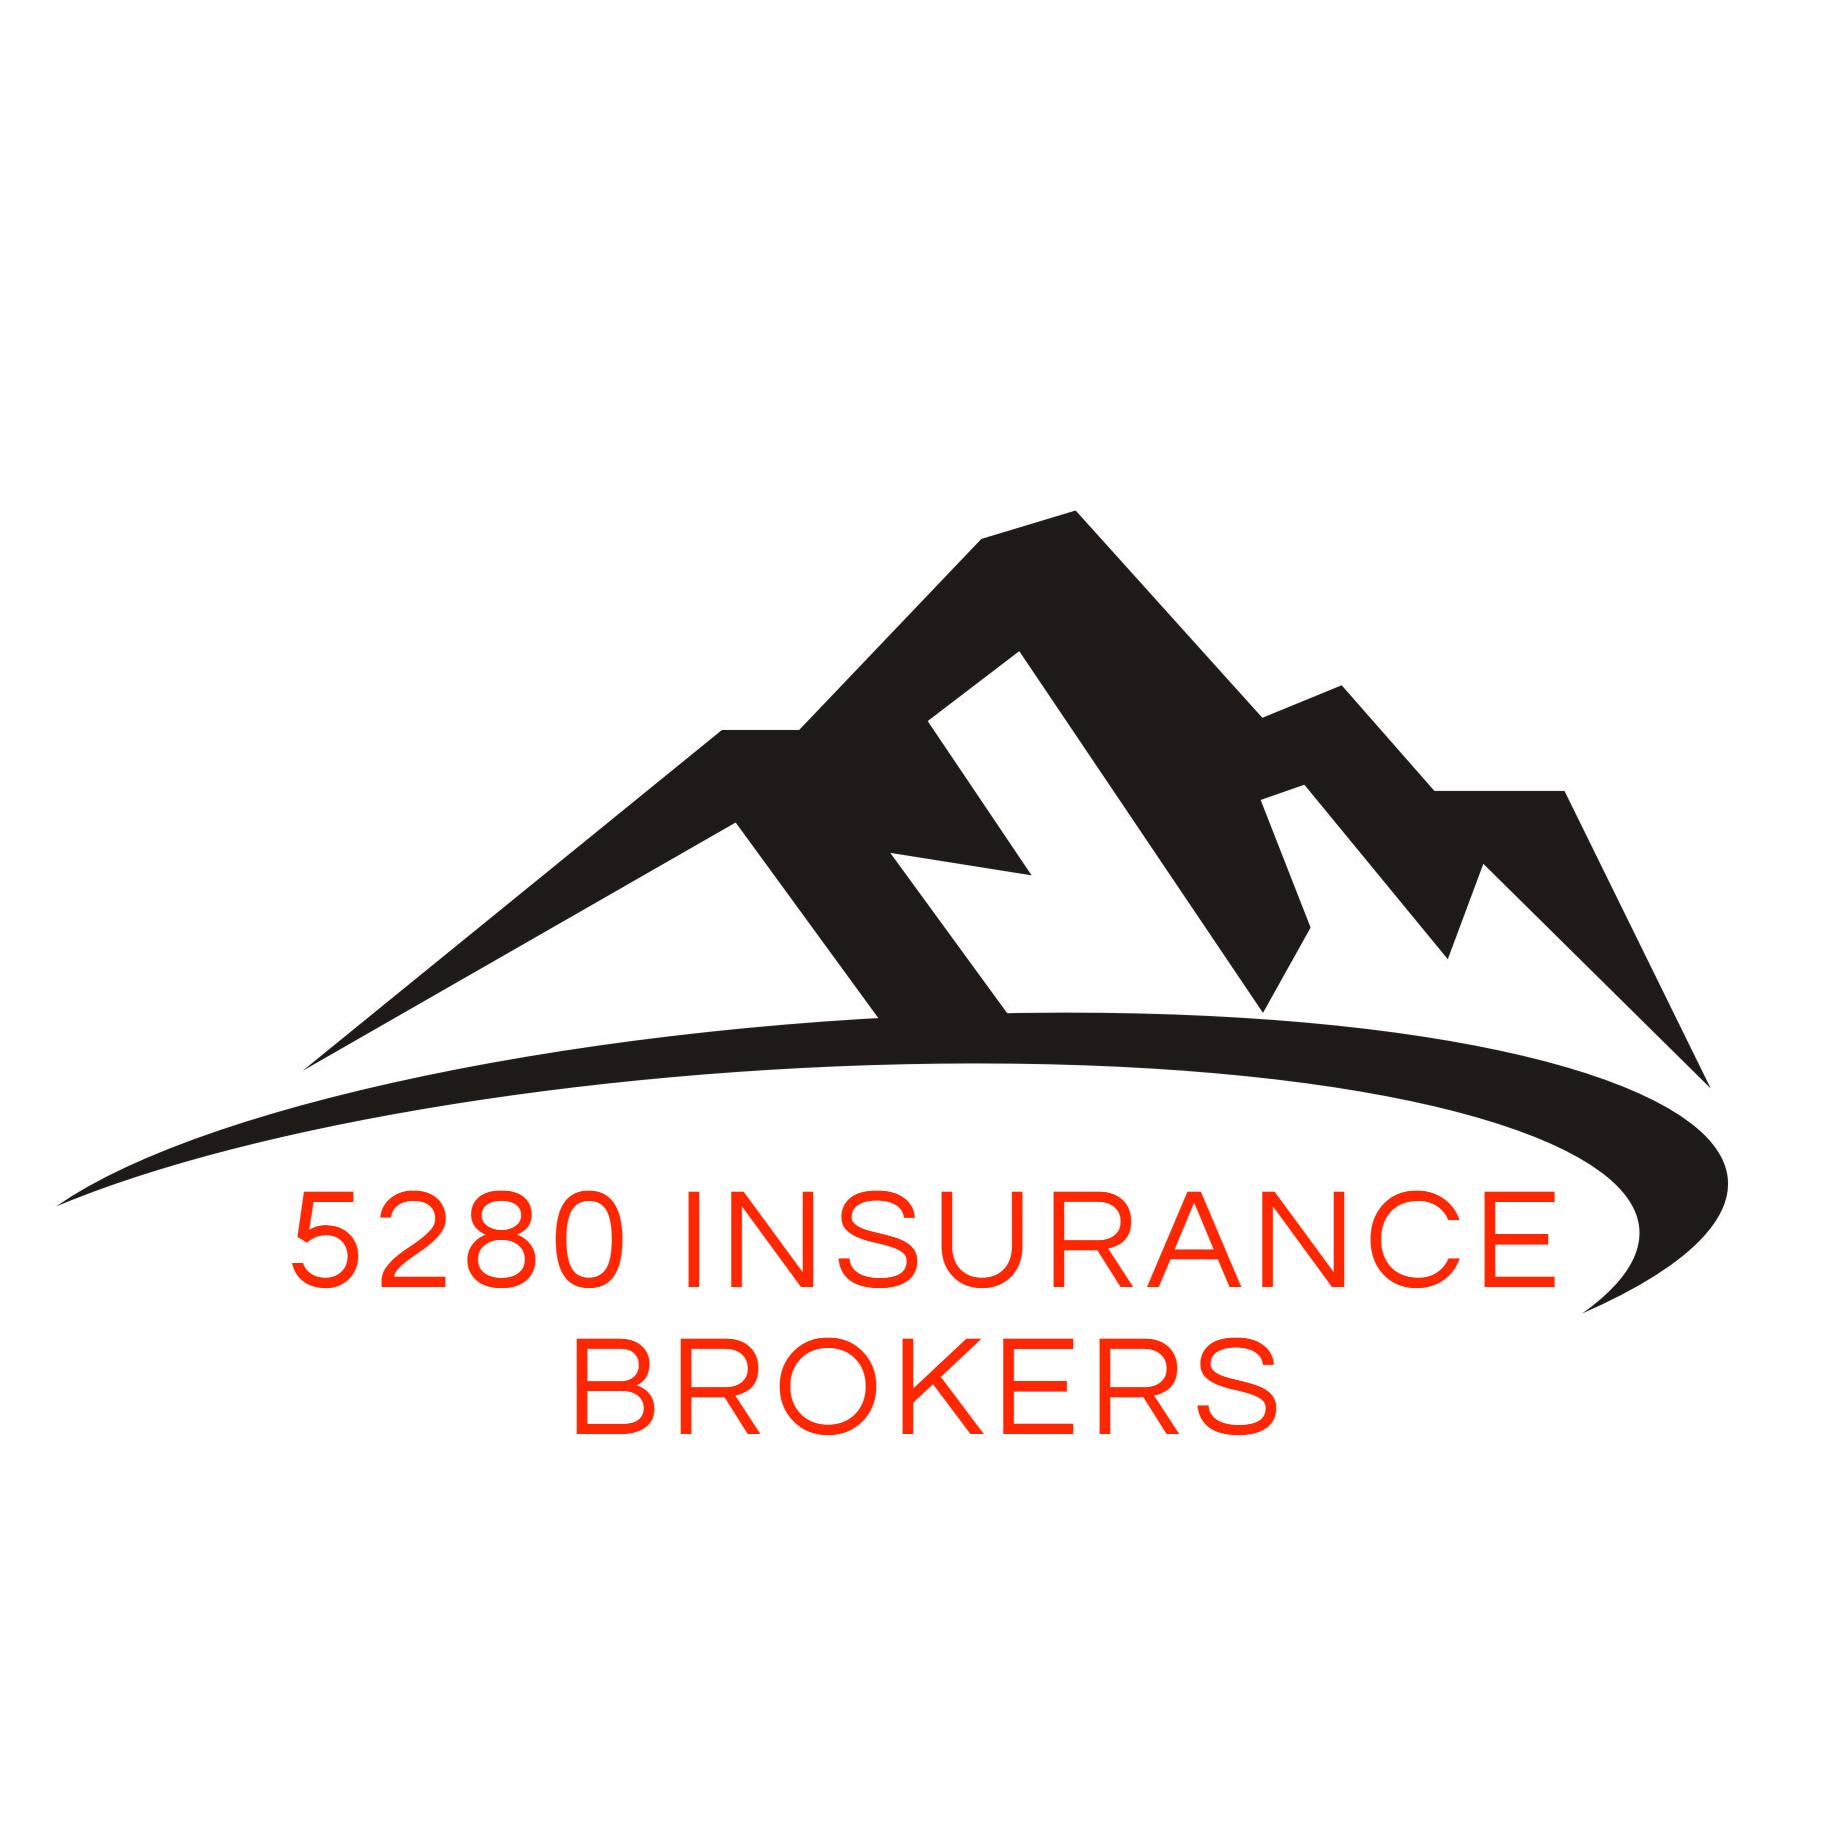 5280 Insurance Brokers image 6